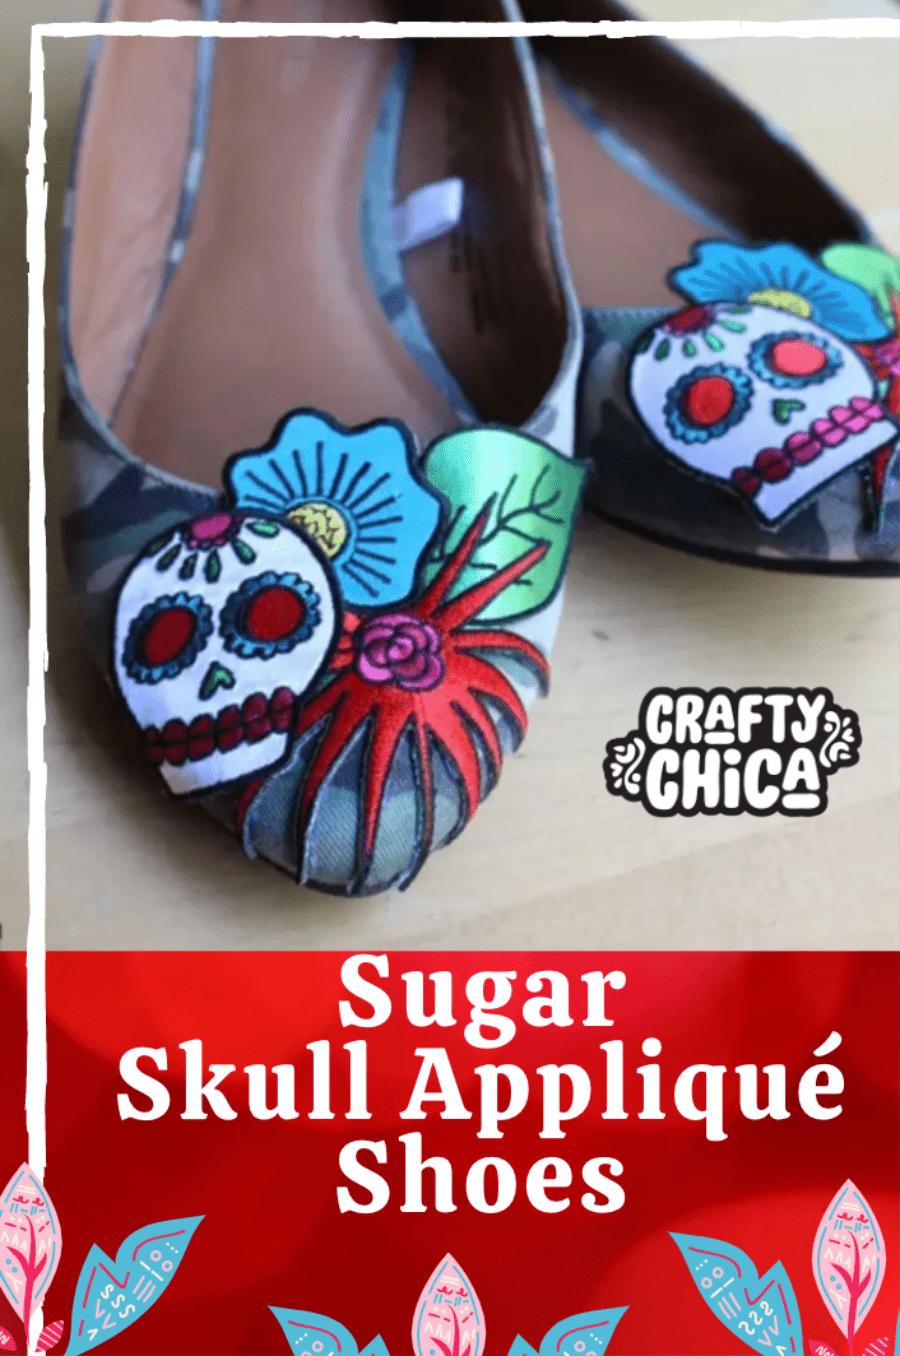 Pin it! Sugar Skull Appliqué Shoes craft DIY